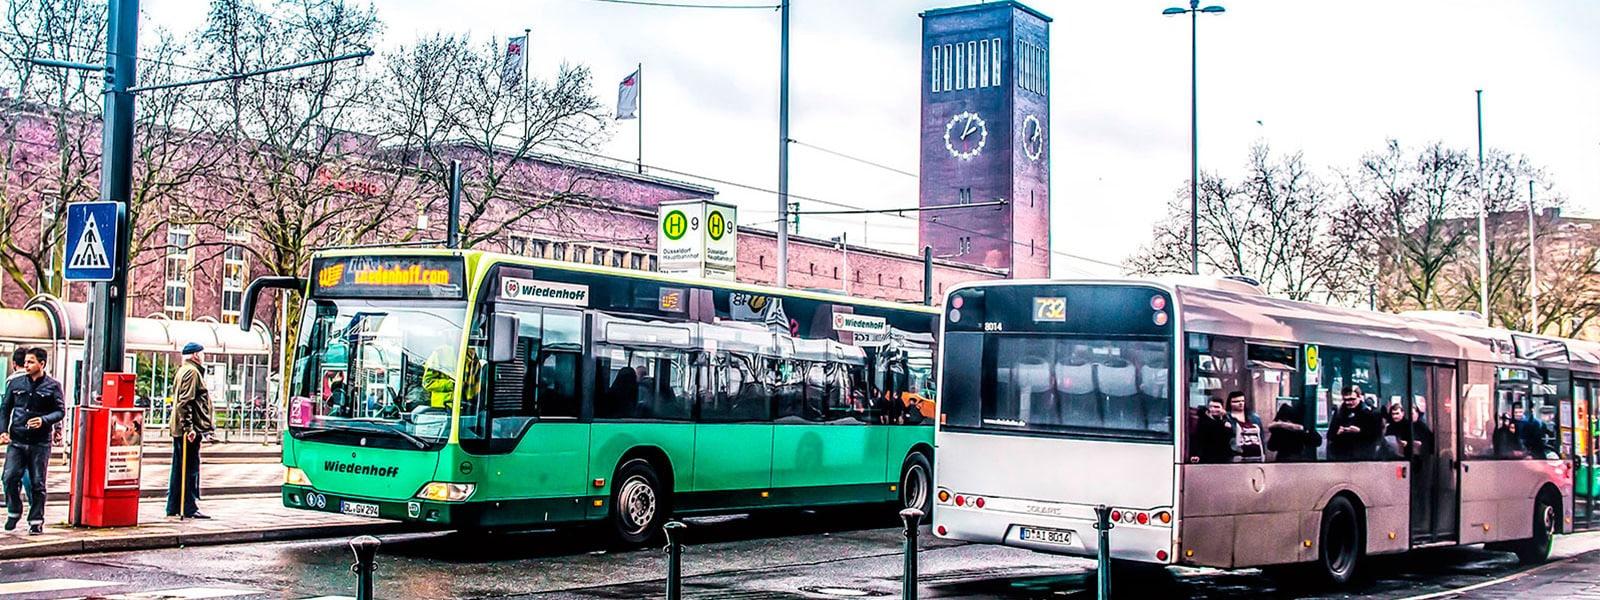 Dortmund-Verkehrsmittelwerbung-bus-werbung